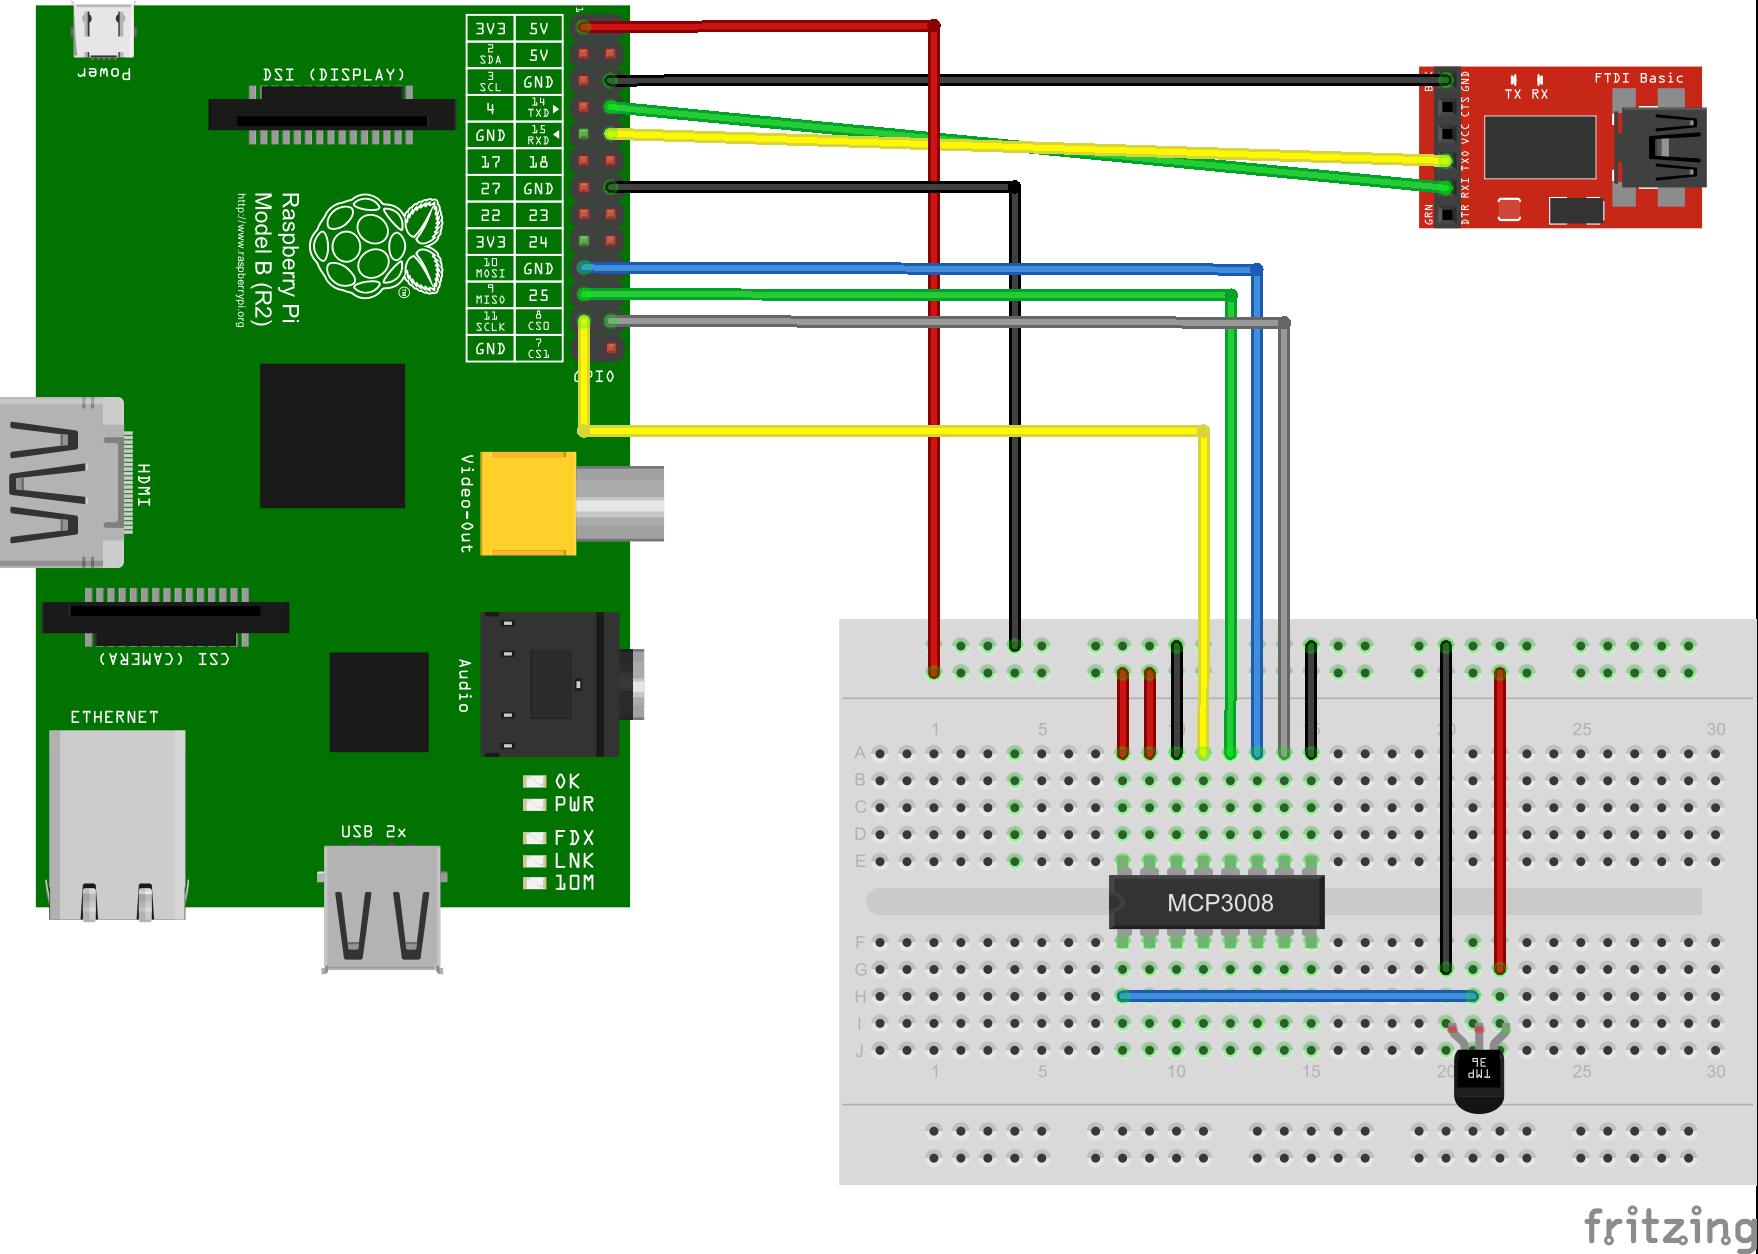 Wiringpi2 Spi Python Free Wiring Diagram For You Wiringpi Not Working U30a2 U30ca U30ed U30b0 U6e29 U5ea6 U30bb U30f3 U30b5 U3068mcp3008 U306ead U30b3 U30d0 U30fc U30bf U3092 U4f7f U3046 Example